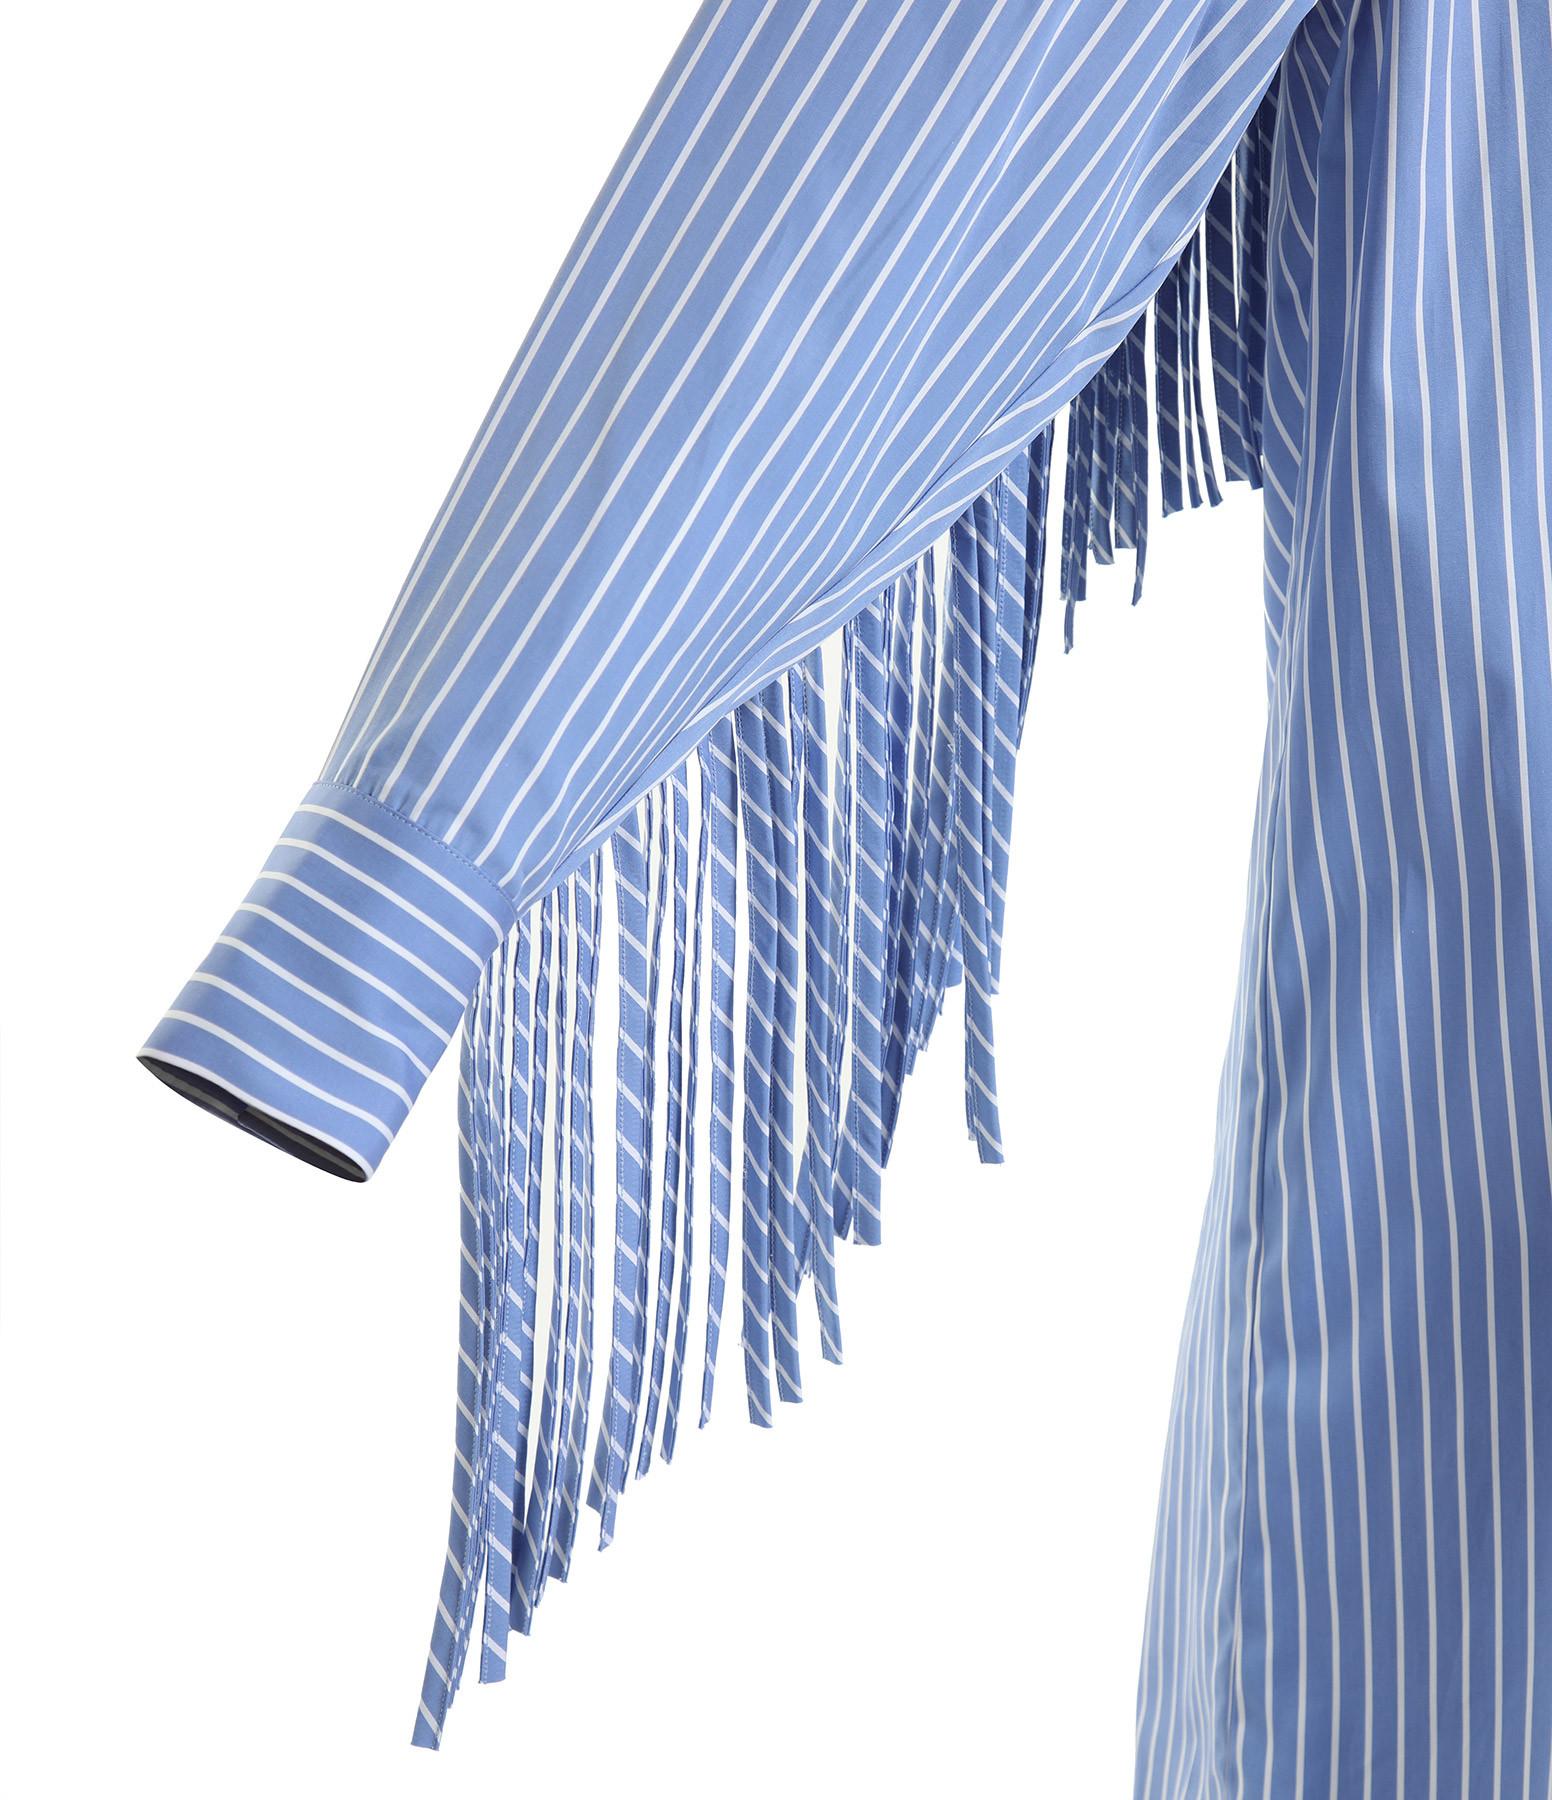 MSGM - Robe Chemise Rayures Coton Bleu